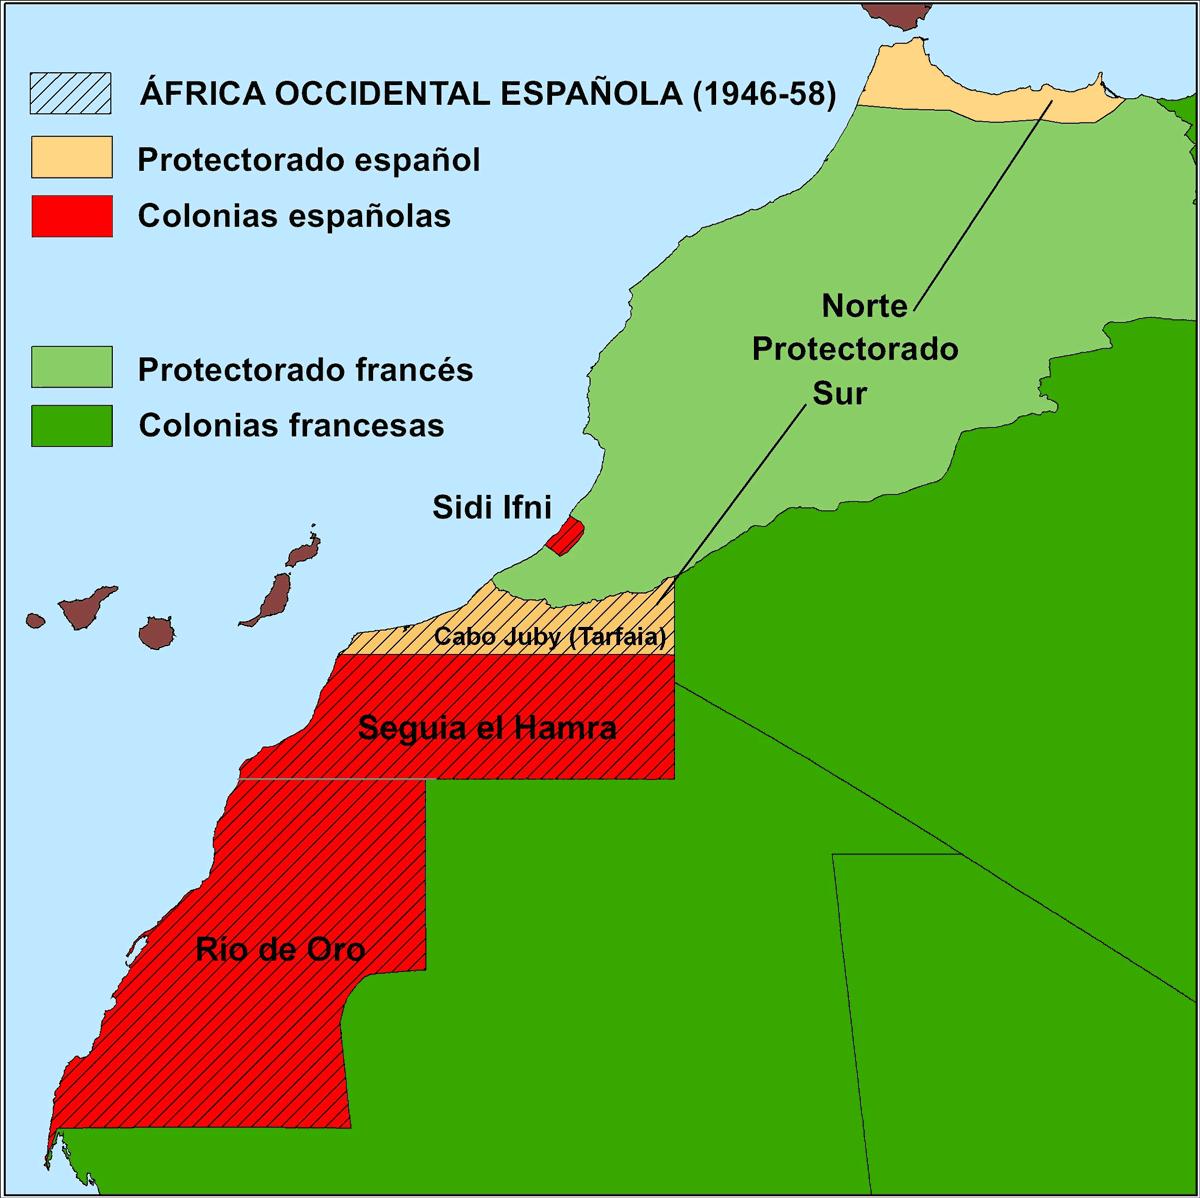 Relieve De Africa Mapa.El Mapa Del Africa Occidental Espanola De 1949 A Escala 1